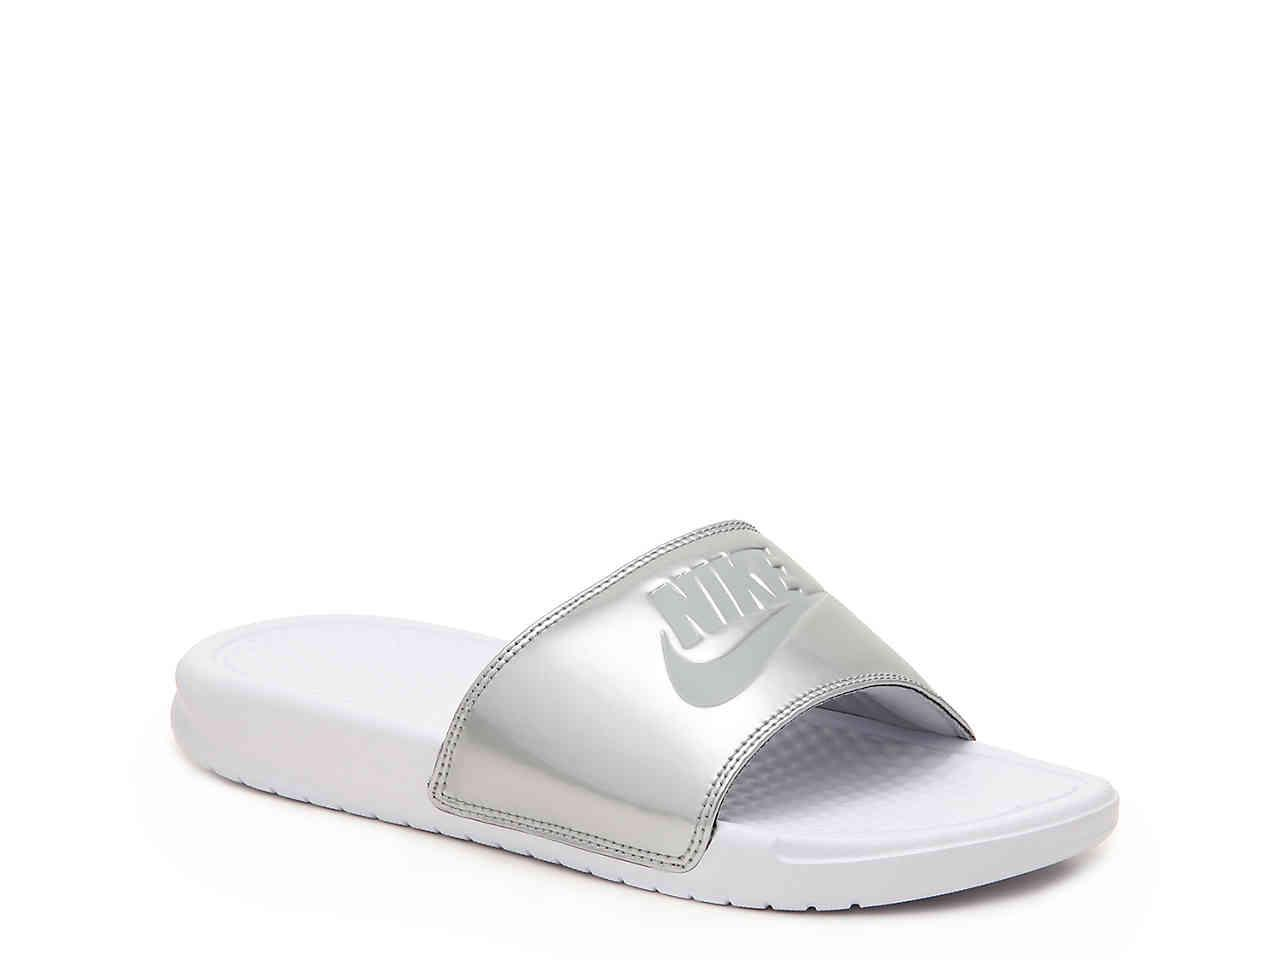 fcf488549fa13 Lyst - Nike Benassi Women s Slide Sandal in Metallic - Save 3%